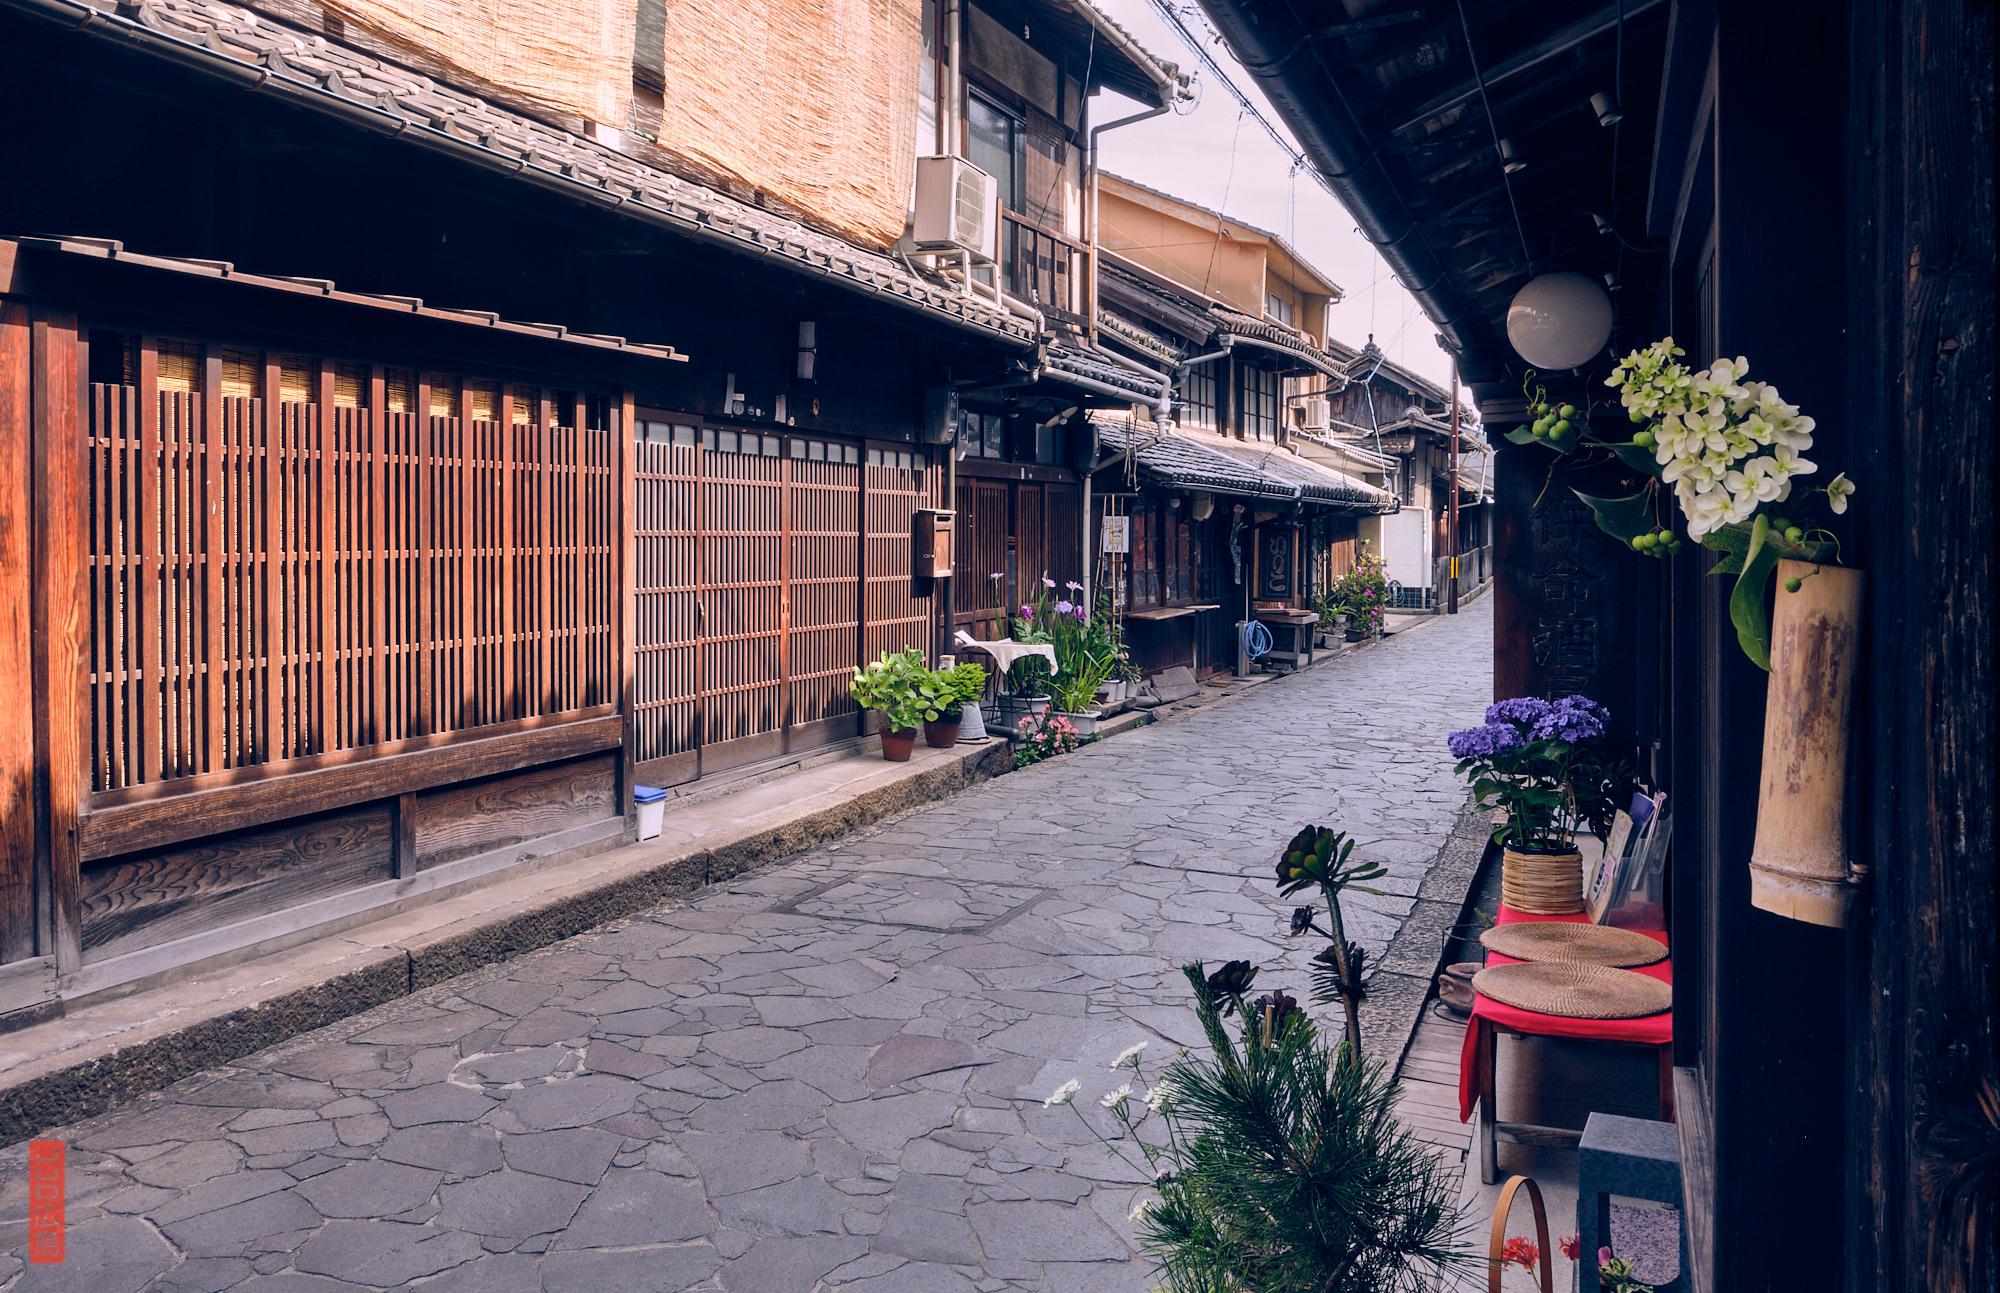 Ruelle historique du centre de Tomo-no-Ura